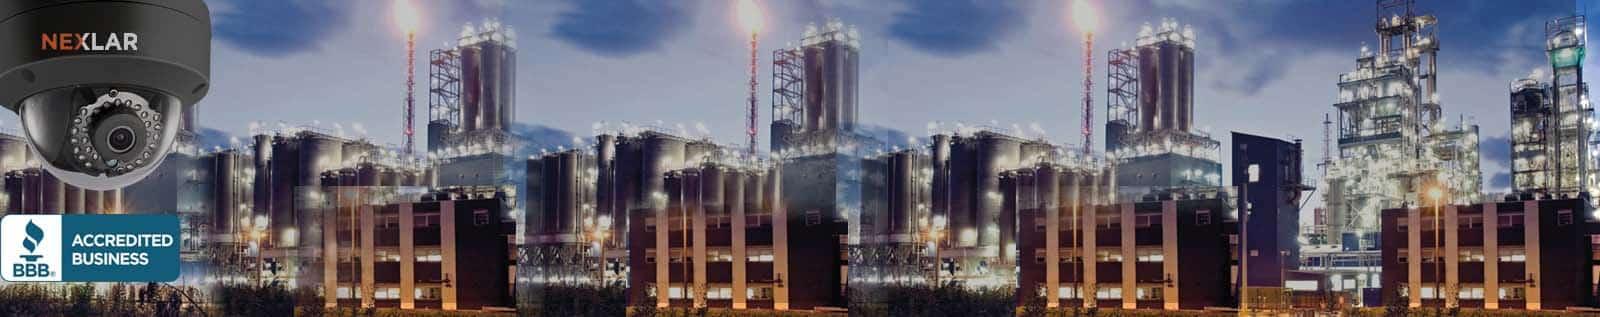 Nexlar Industrial Security Banner